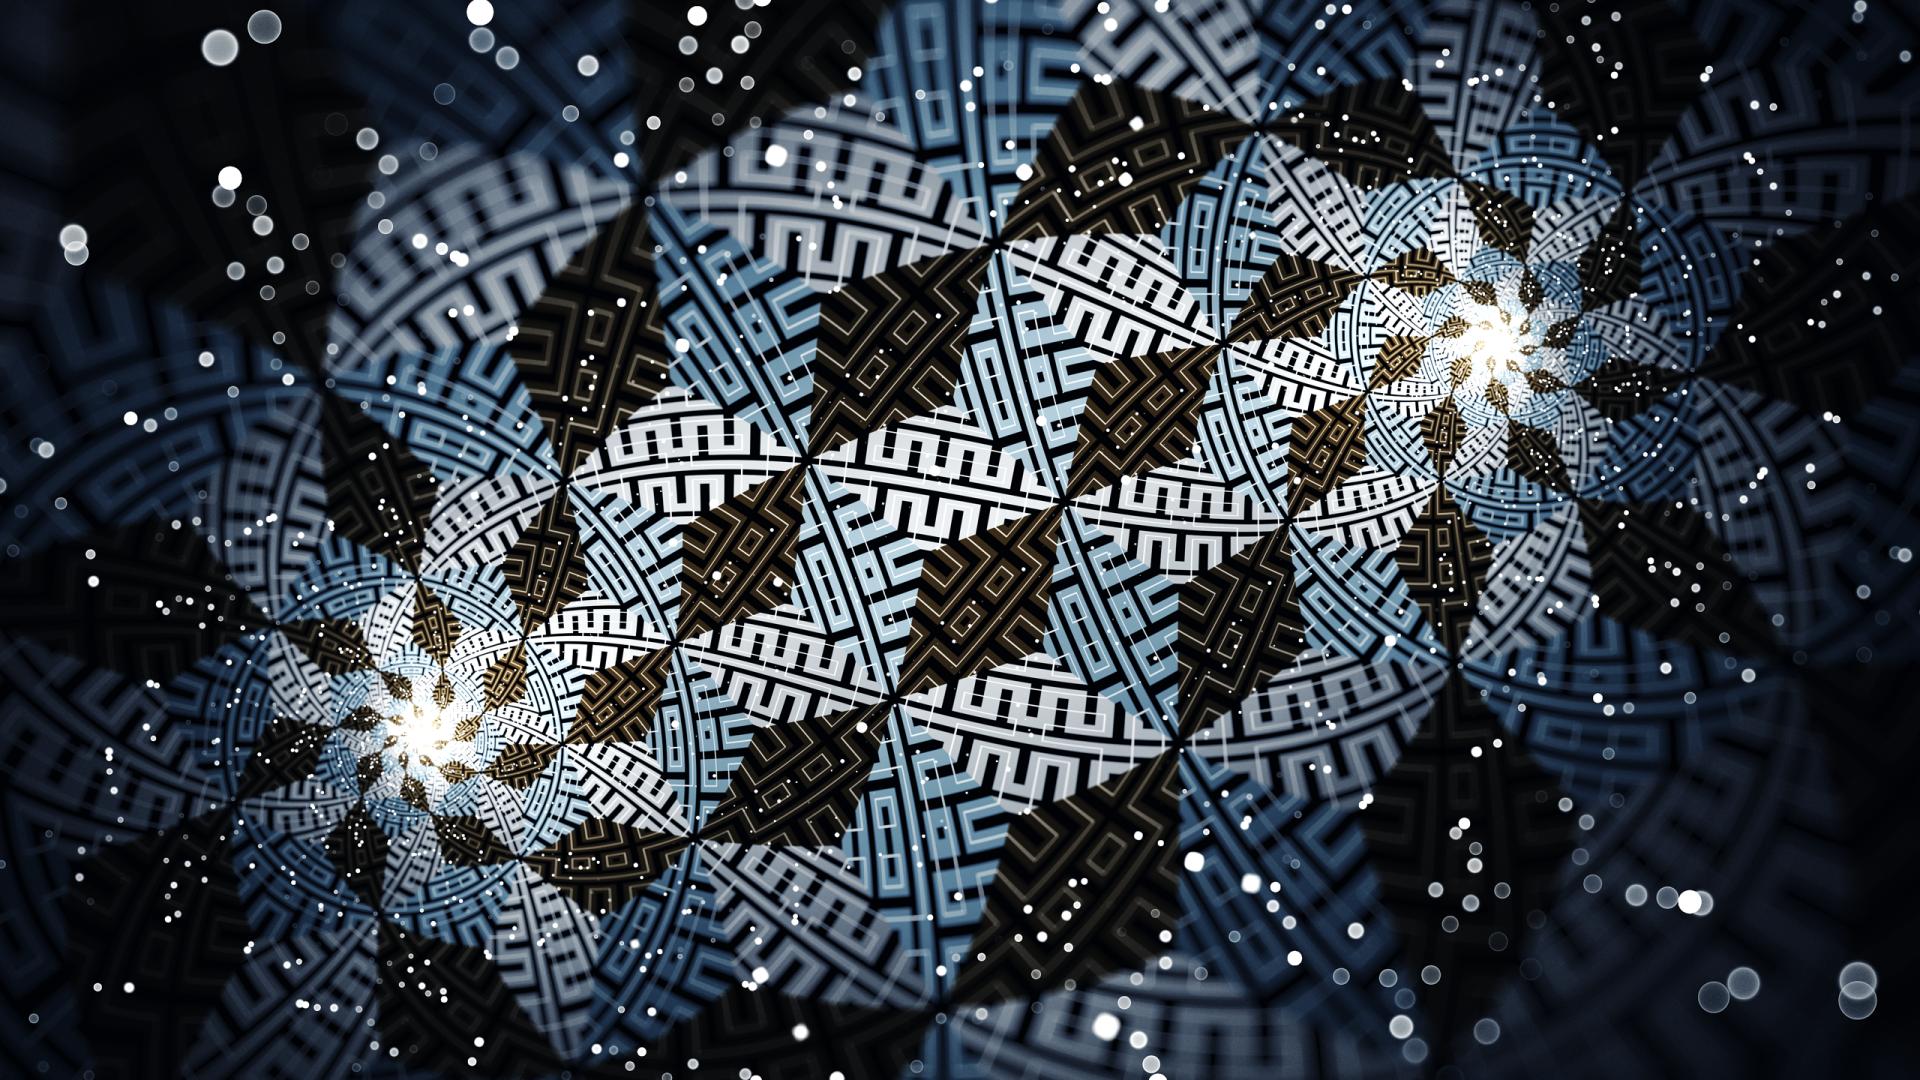 Abstract - Fractal  Artistic Pattern Spiral Digital Art Abstract Wallpaper